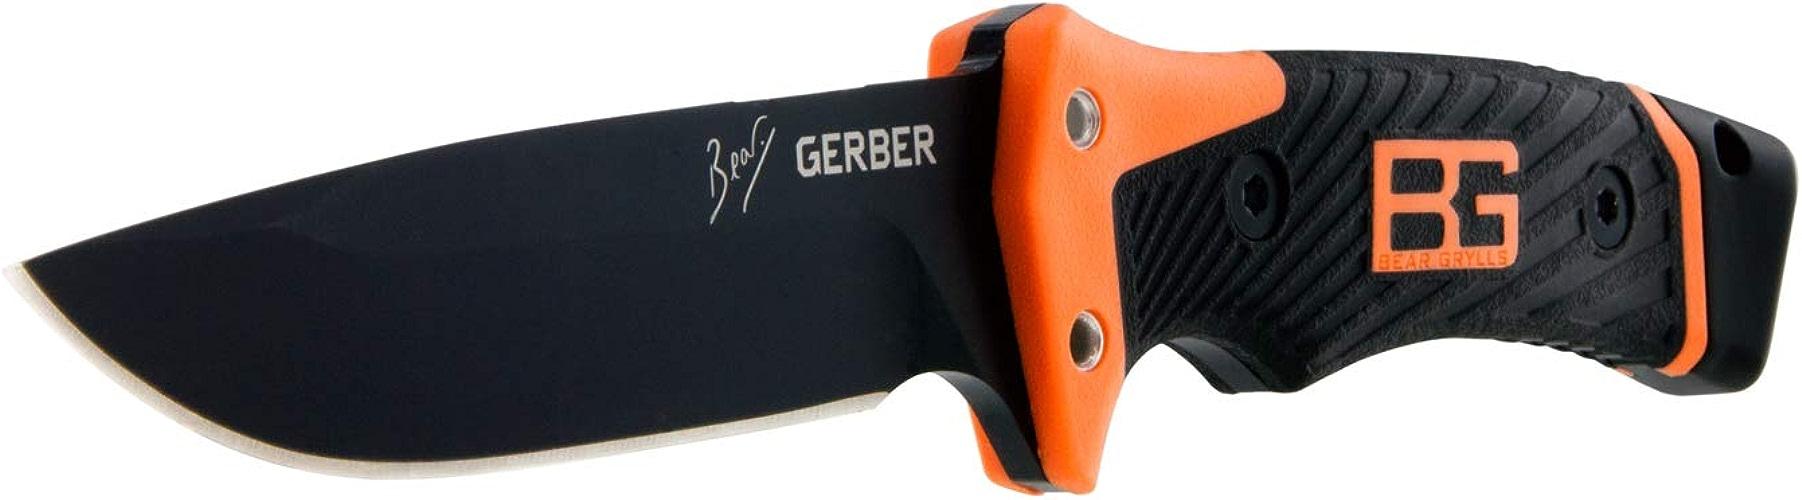 Gerber Bear Grylls Ultimate Pro Couteau à lame fixe Orange gris